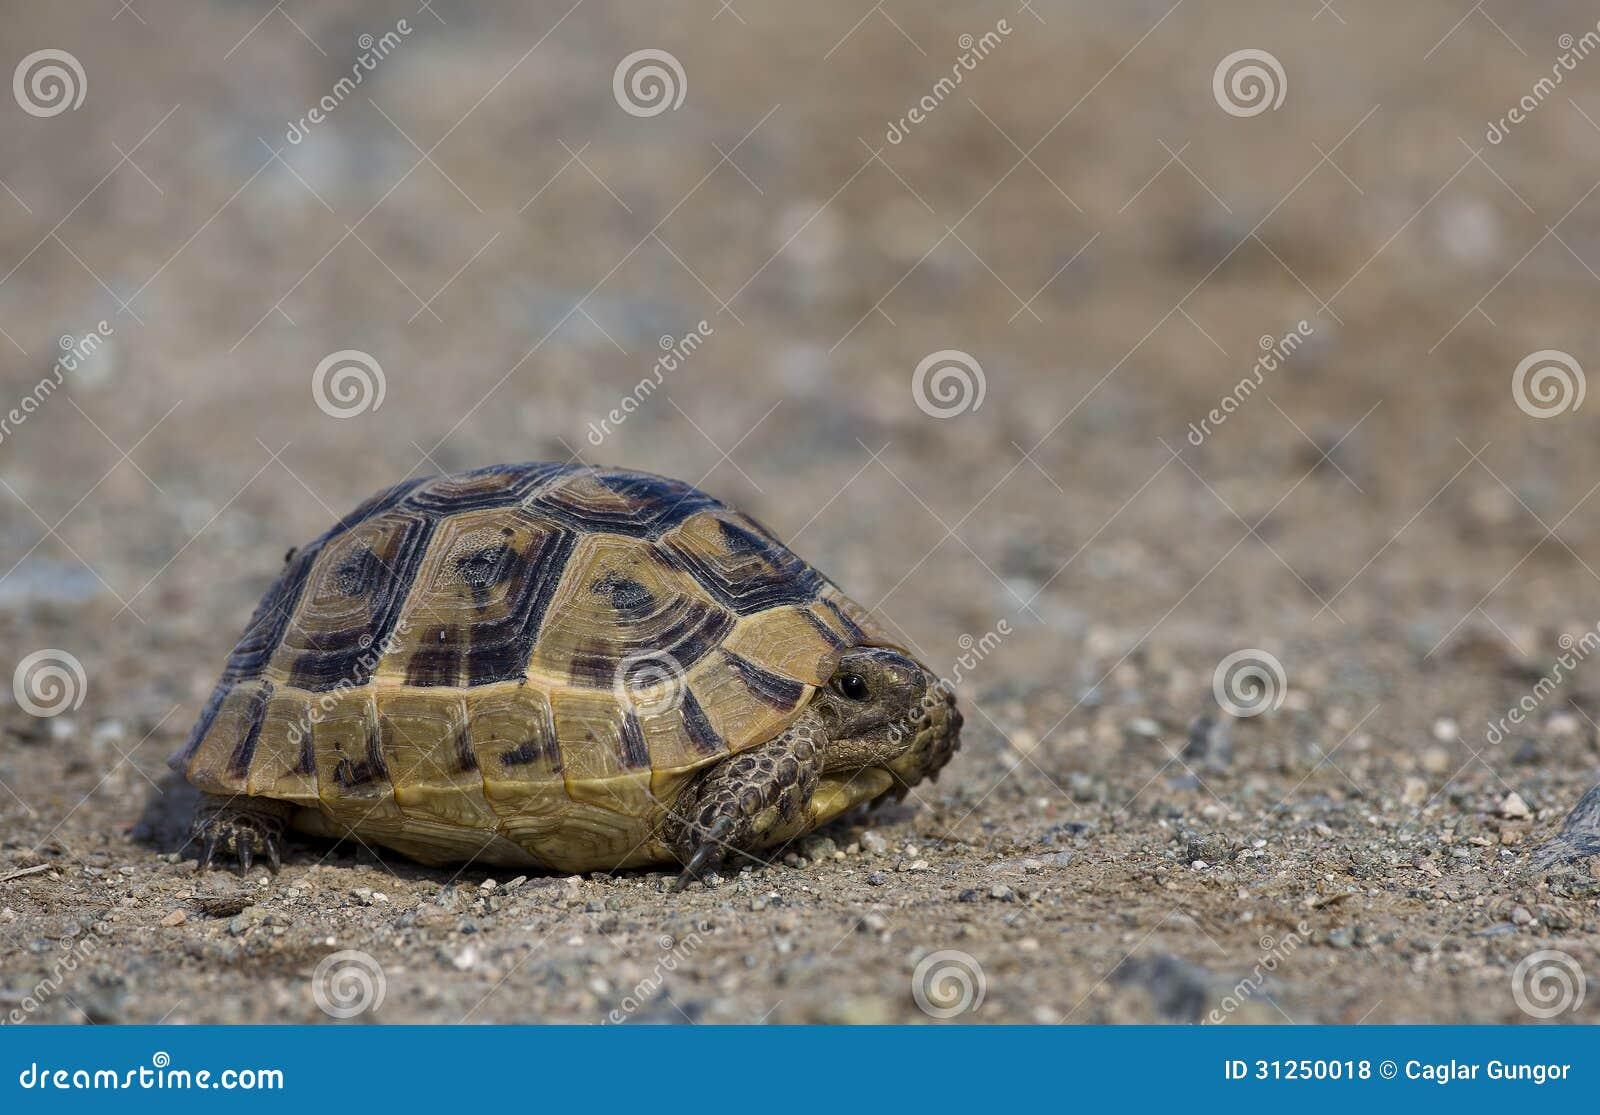 mediterranean spur thighed tortoise royalty free stock